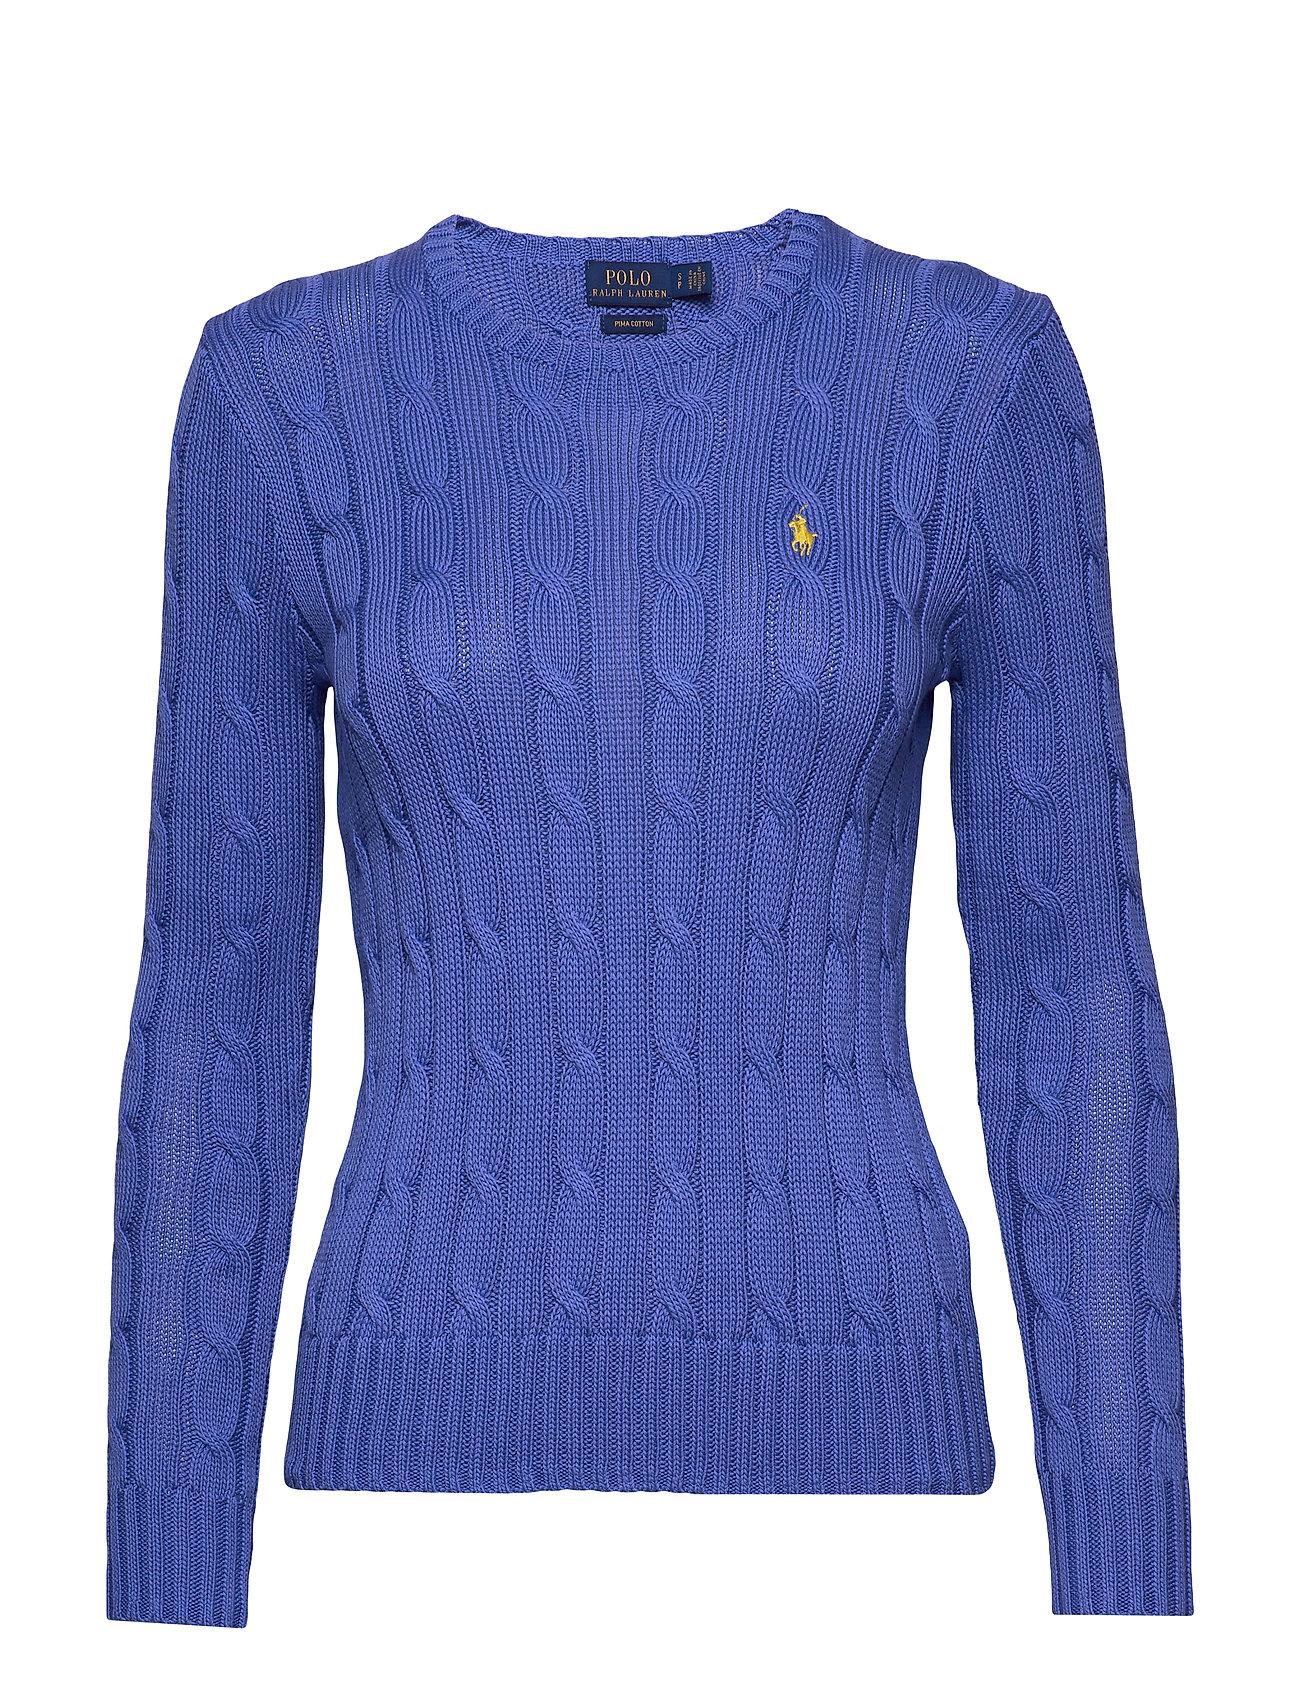 Polo Ralph Lauren Cable-Knit Cotton Sweater - BAR HARBOR BLUE